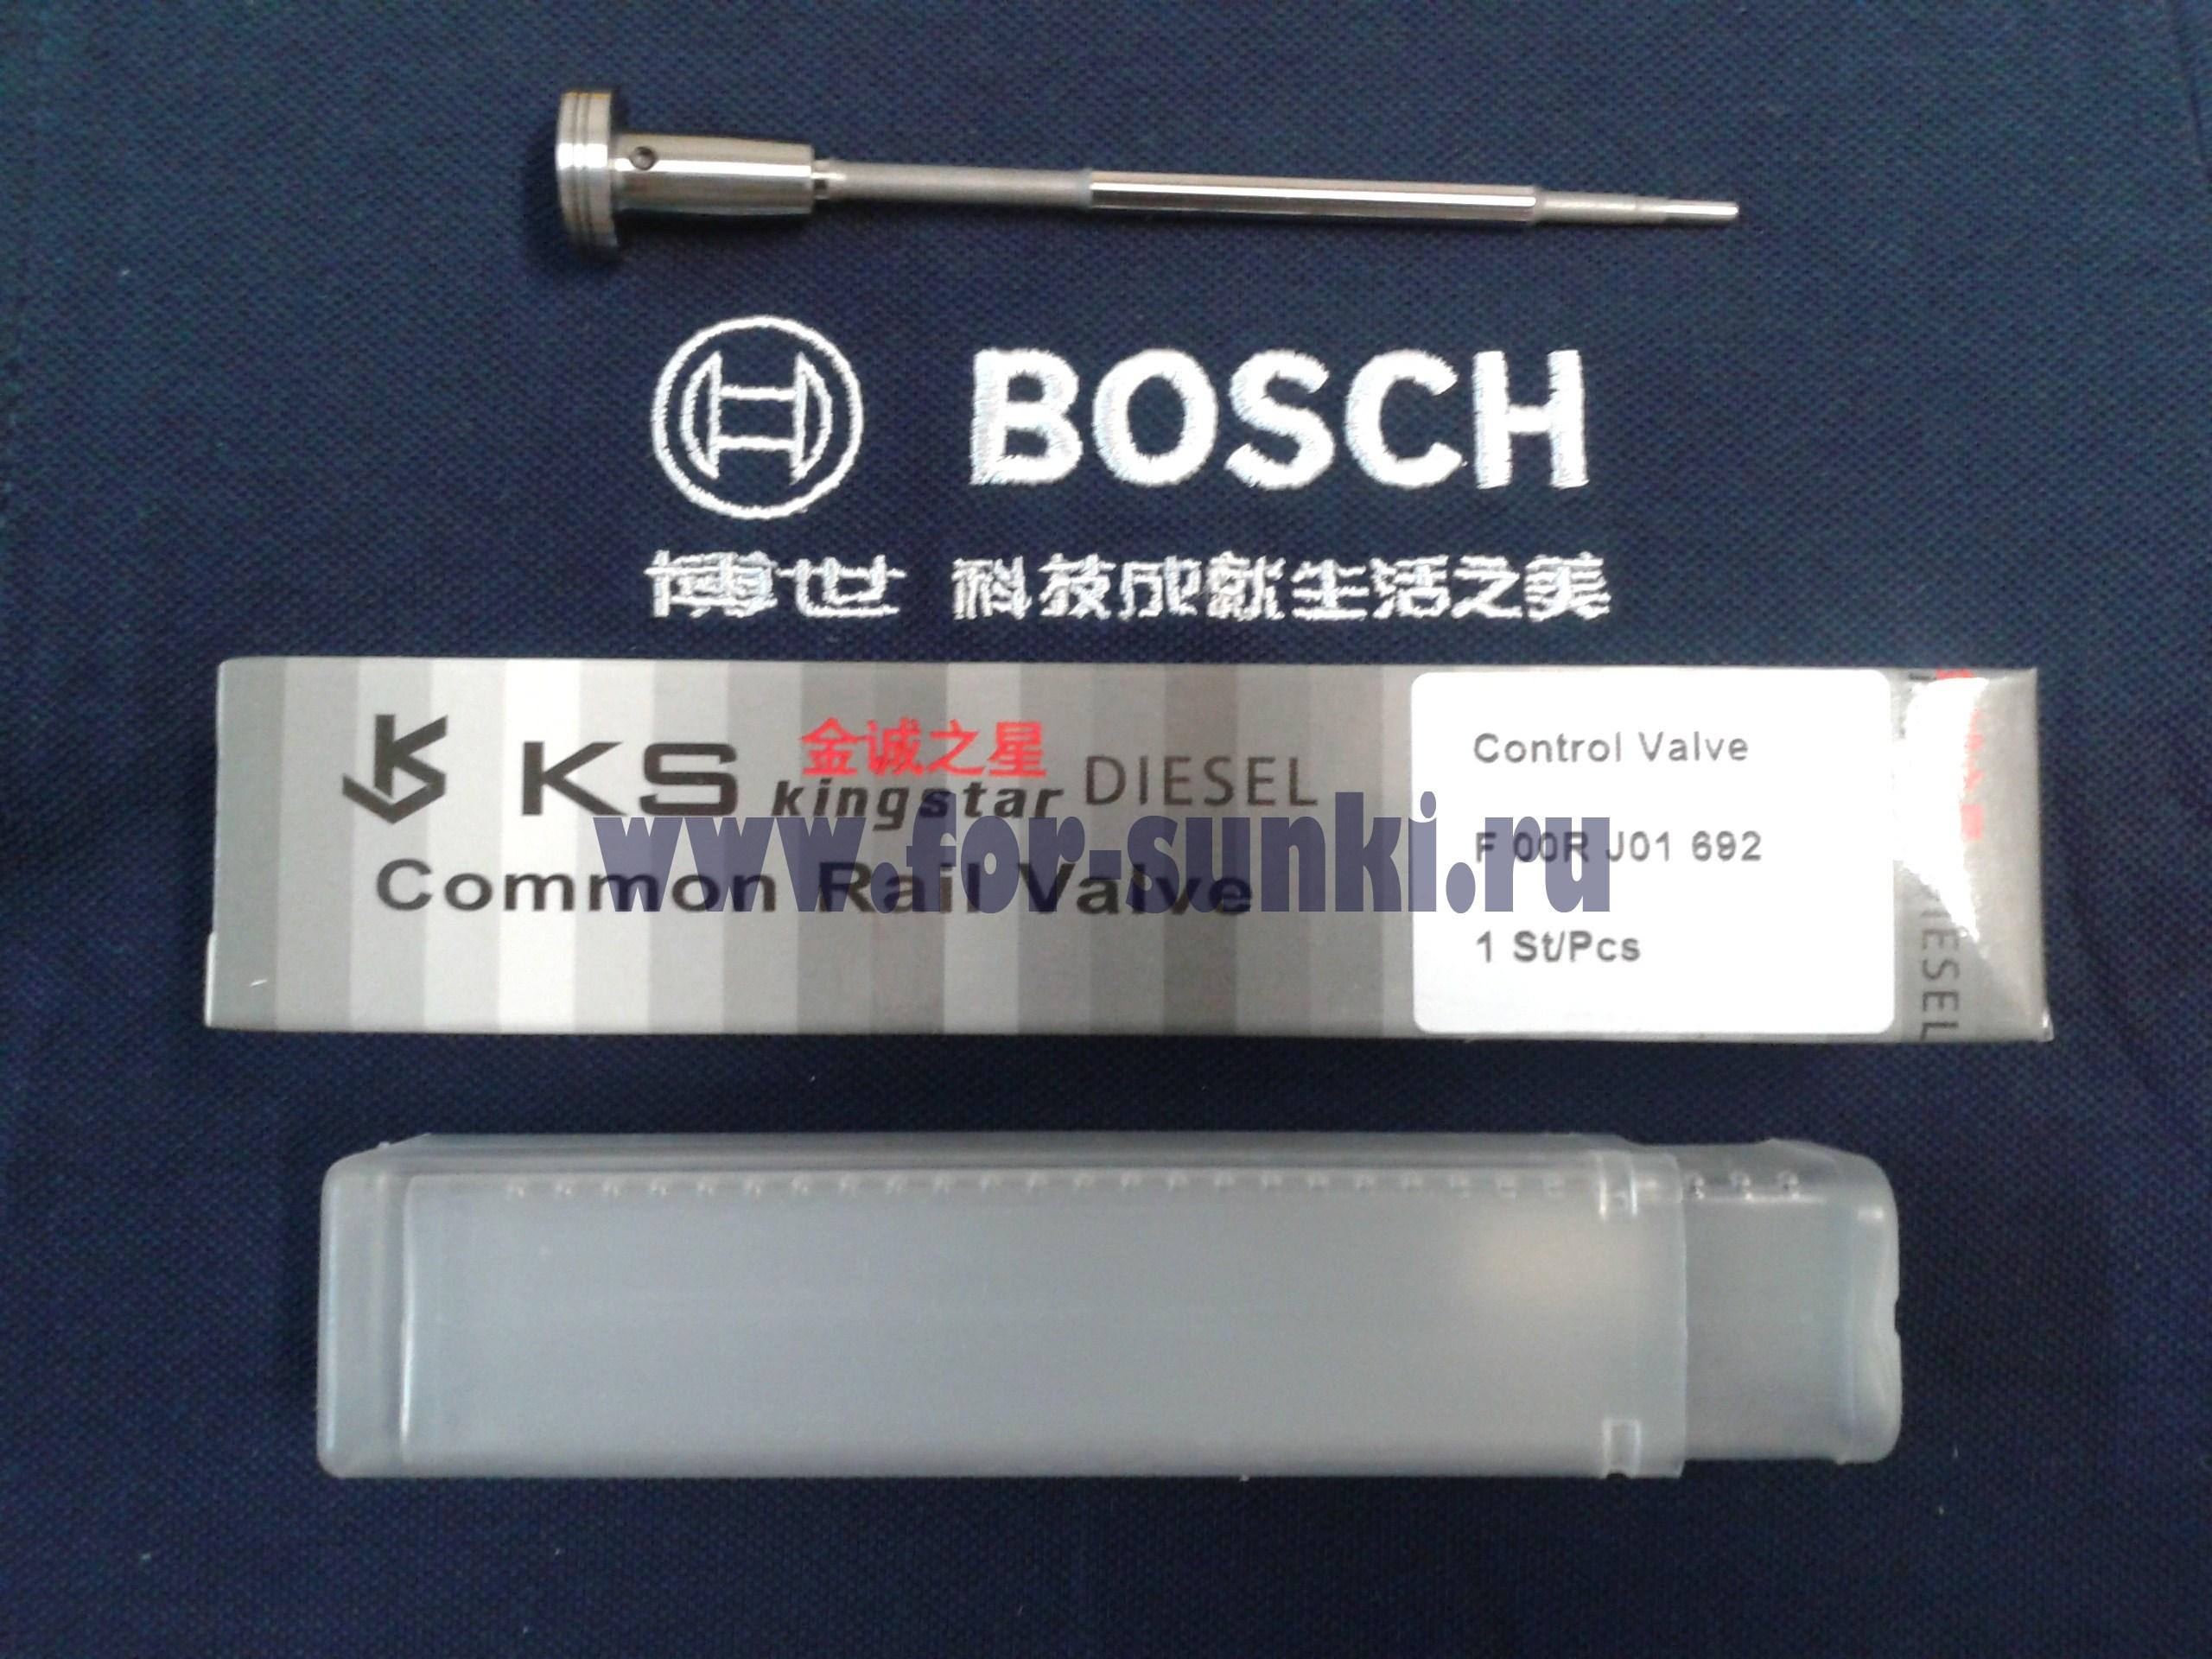 Клапан форсунки (БОШ, BOSCH) - F00VC01383